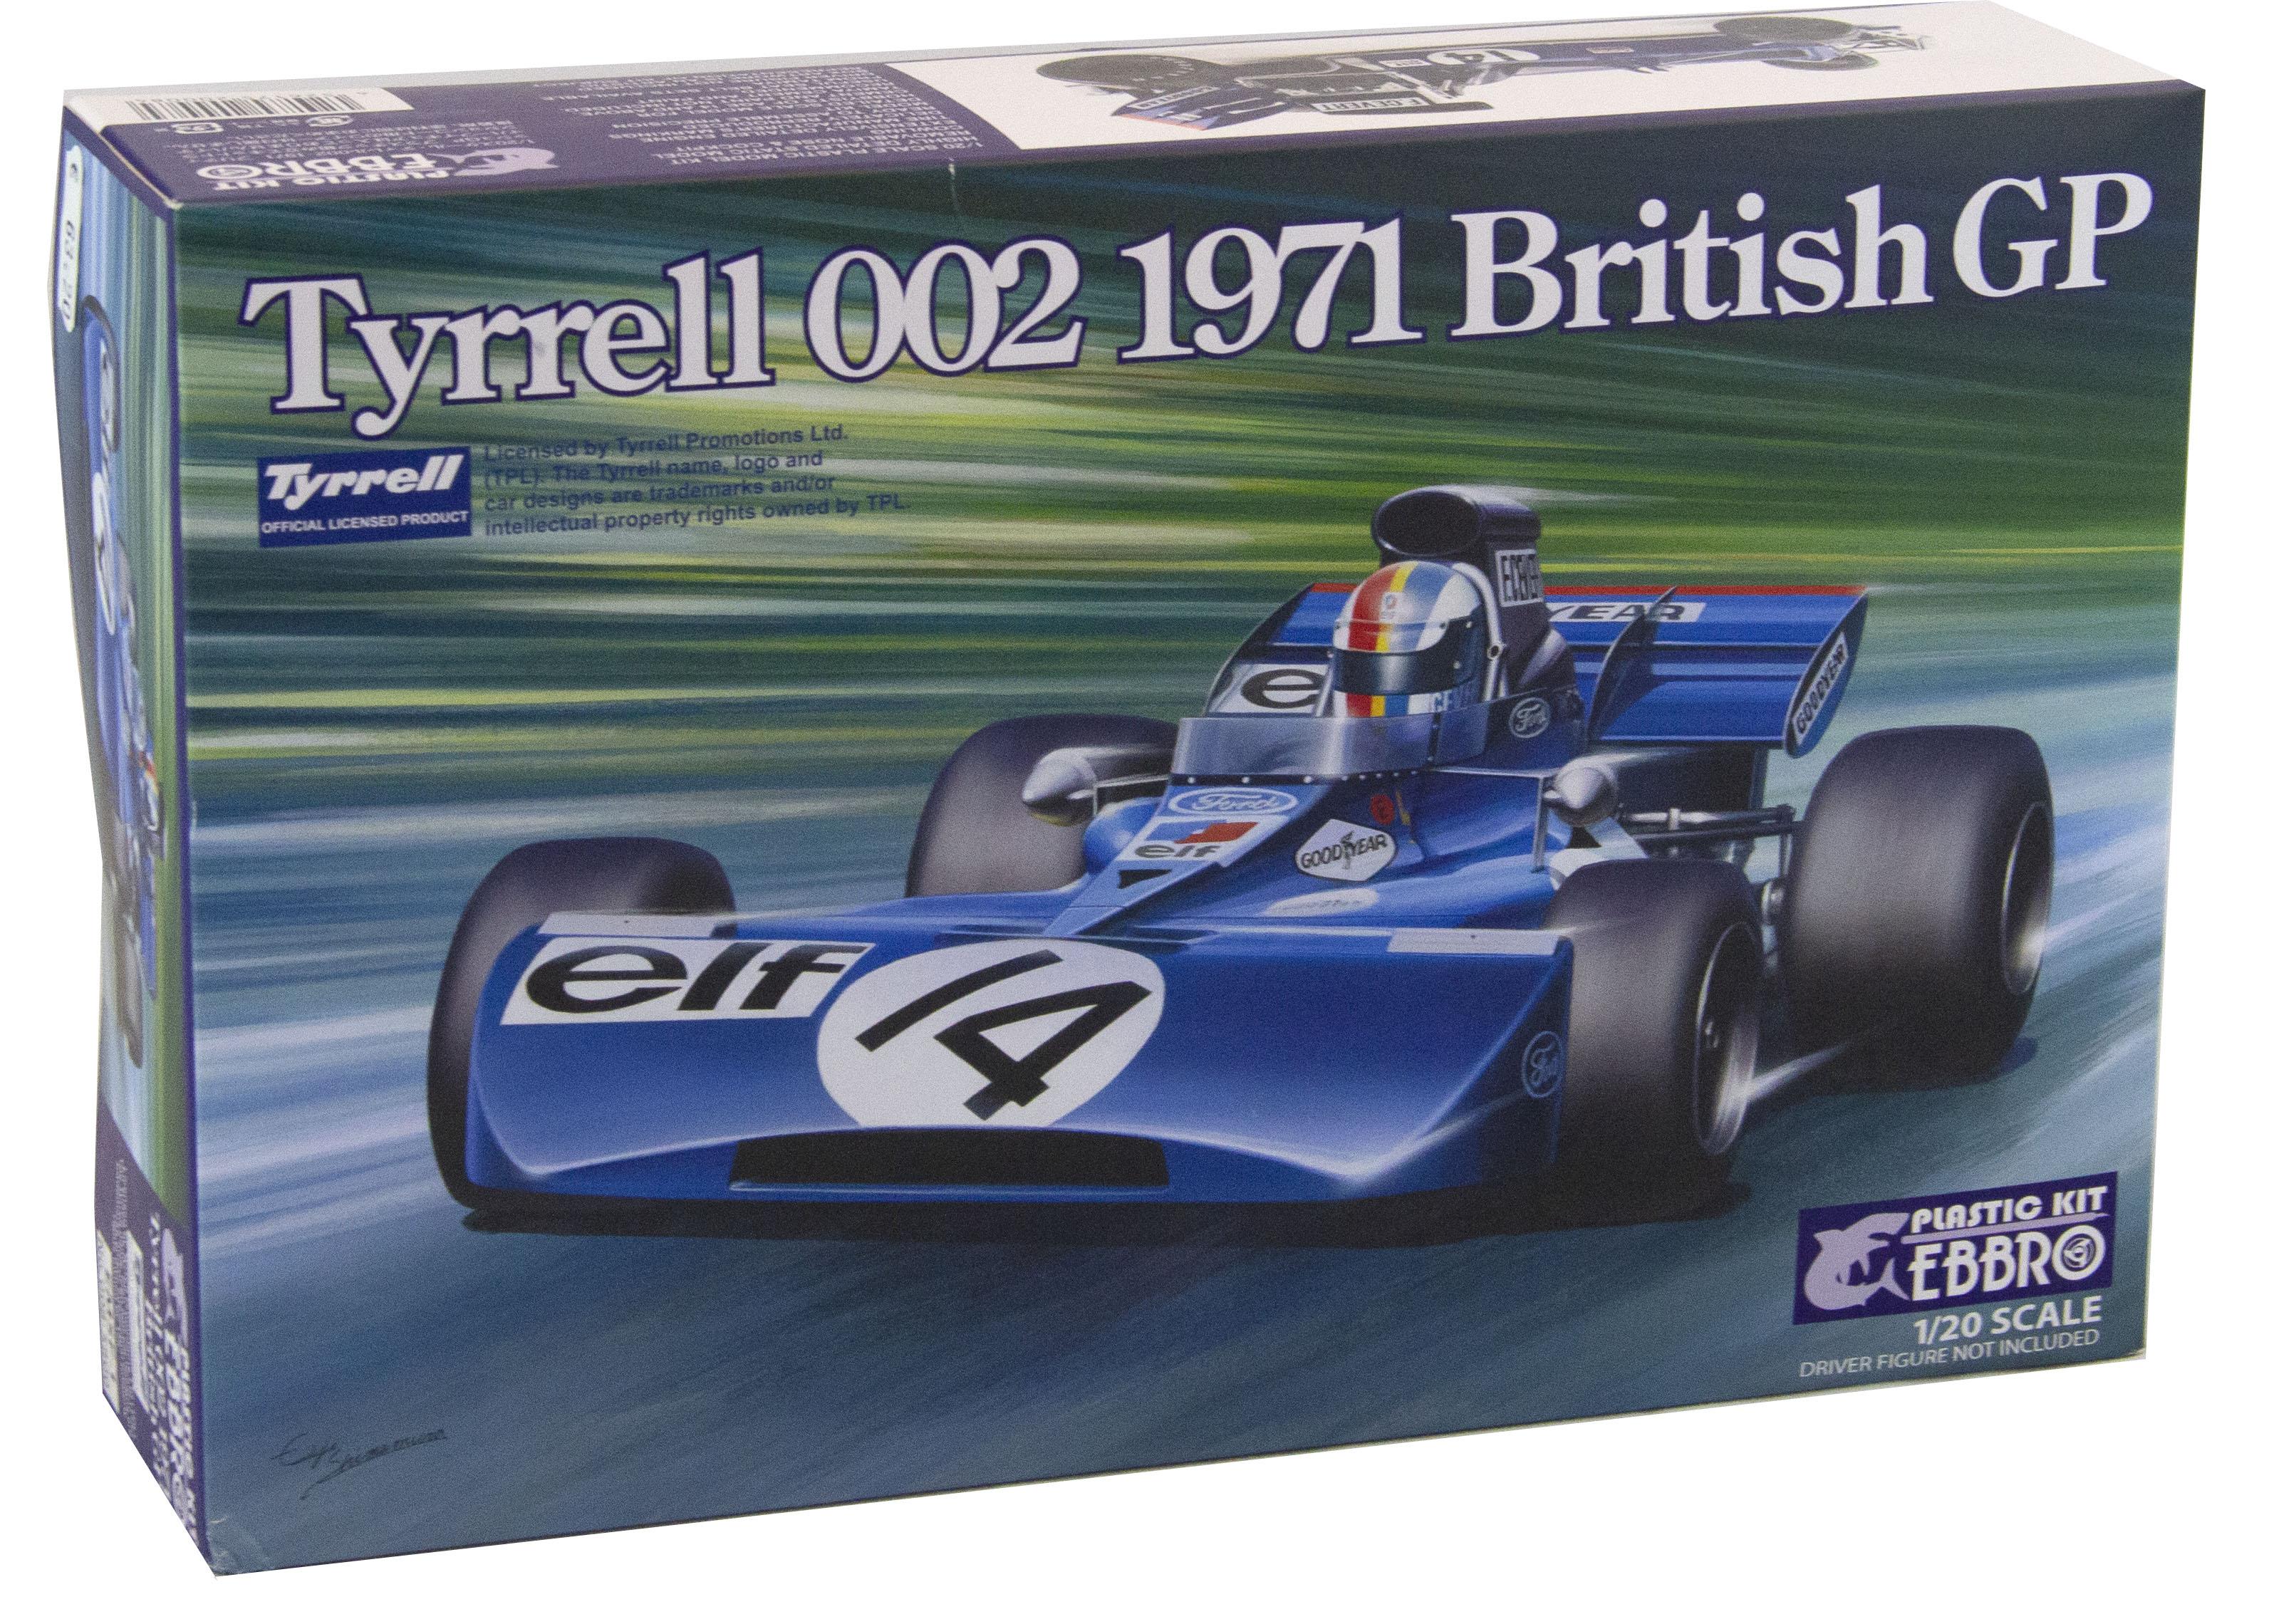 Kit Auto f1 Tyrrell 002  1971 British Gp - 1/20